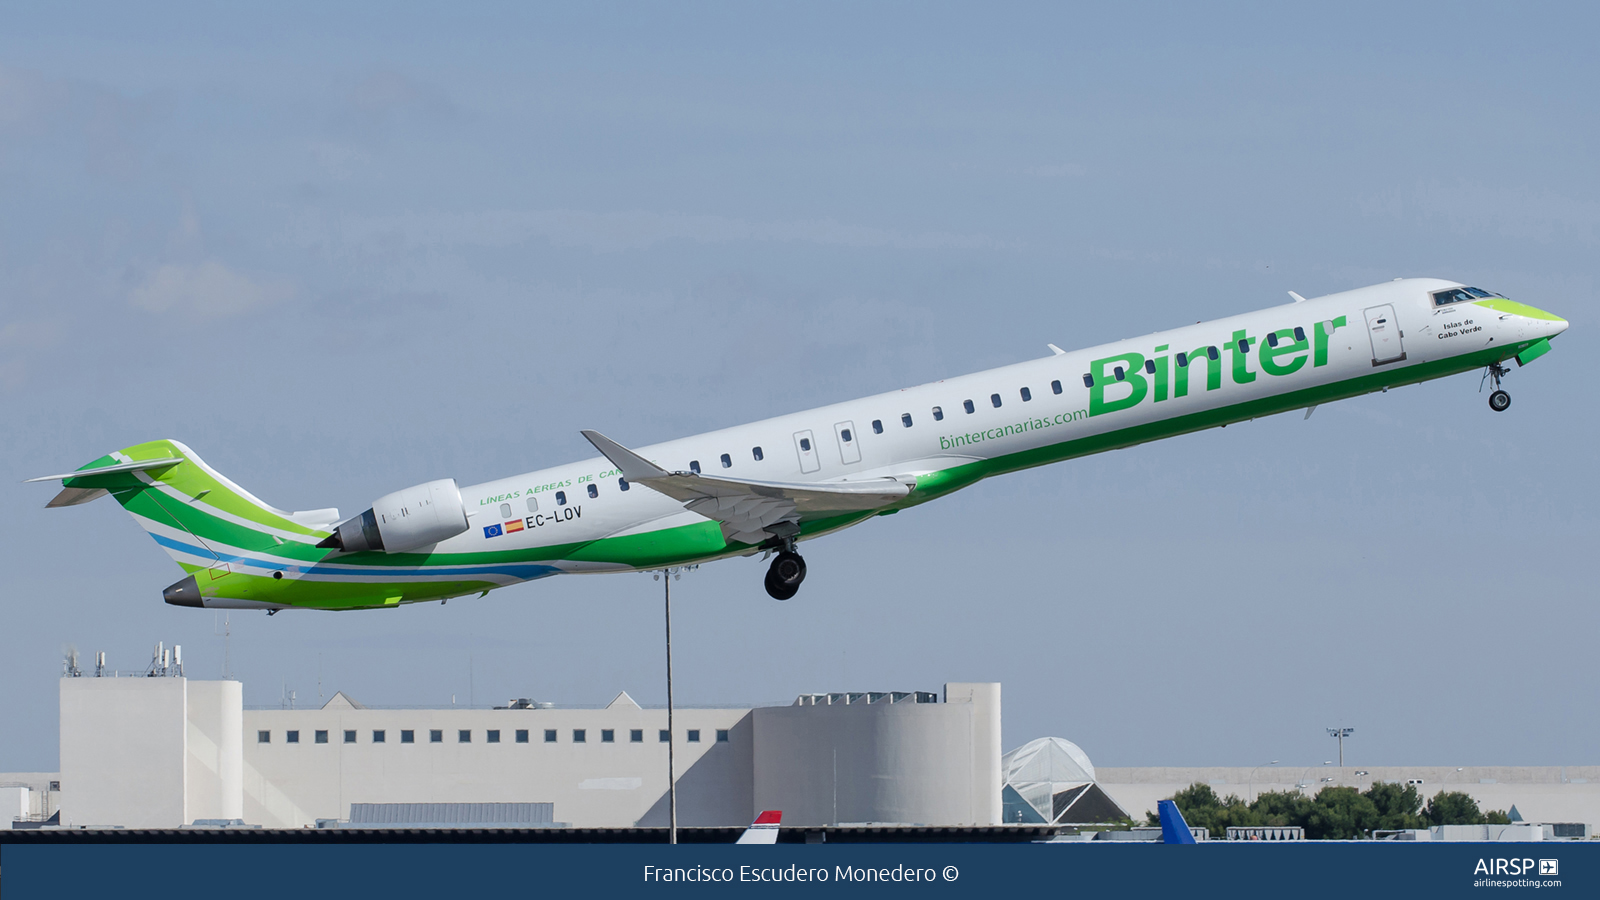 Binter Canarias  Bombardier CRJ-1000  EC-LOV